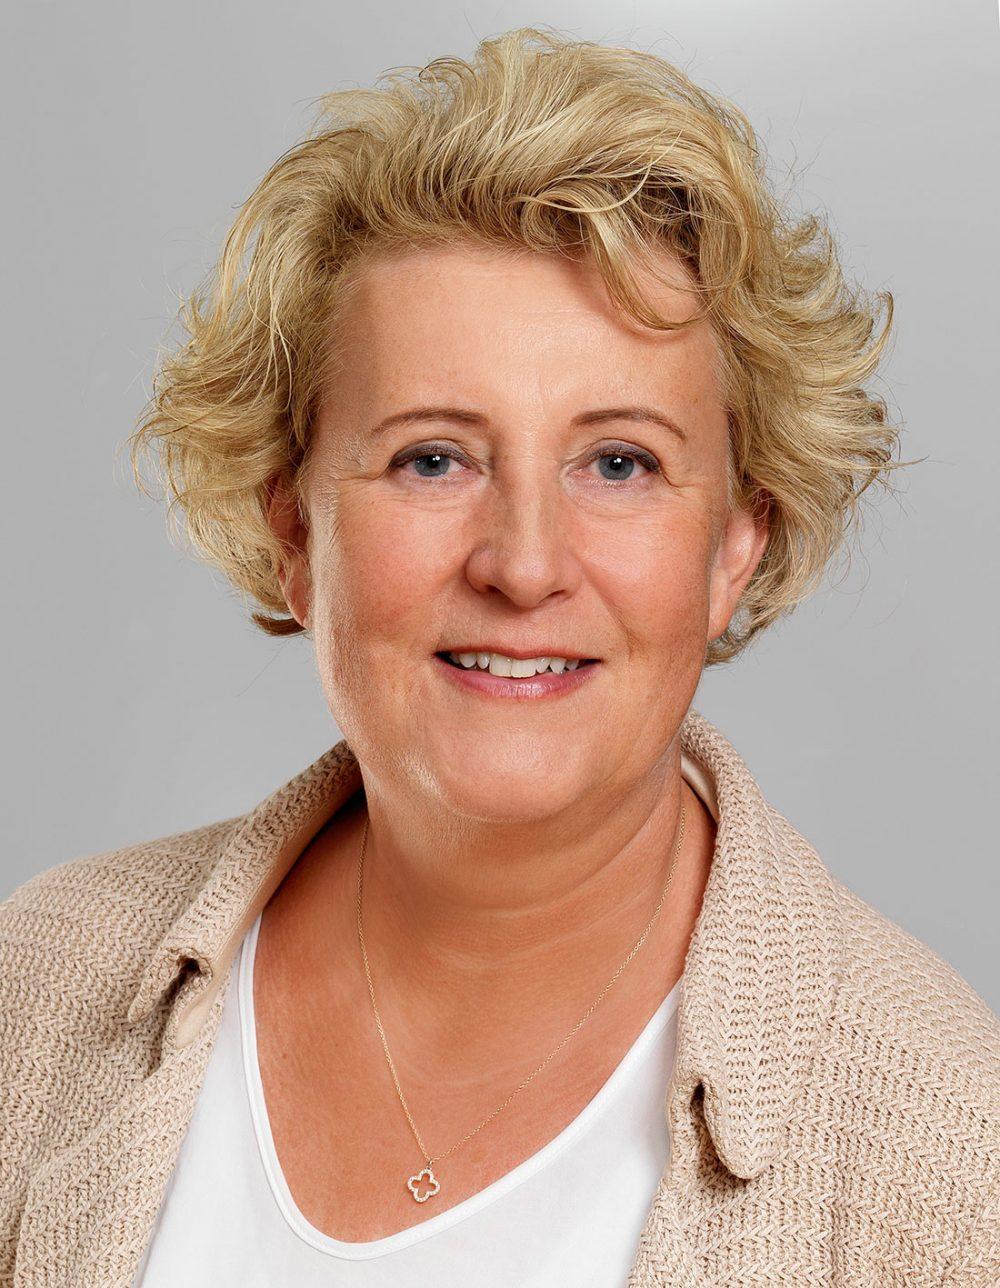 Zahnärtin Dr. Susanne Raaf in Ettlingen